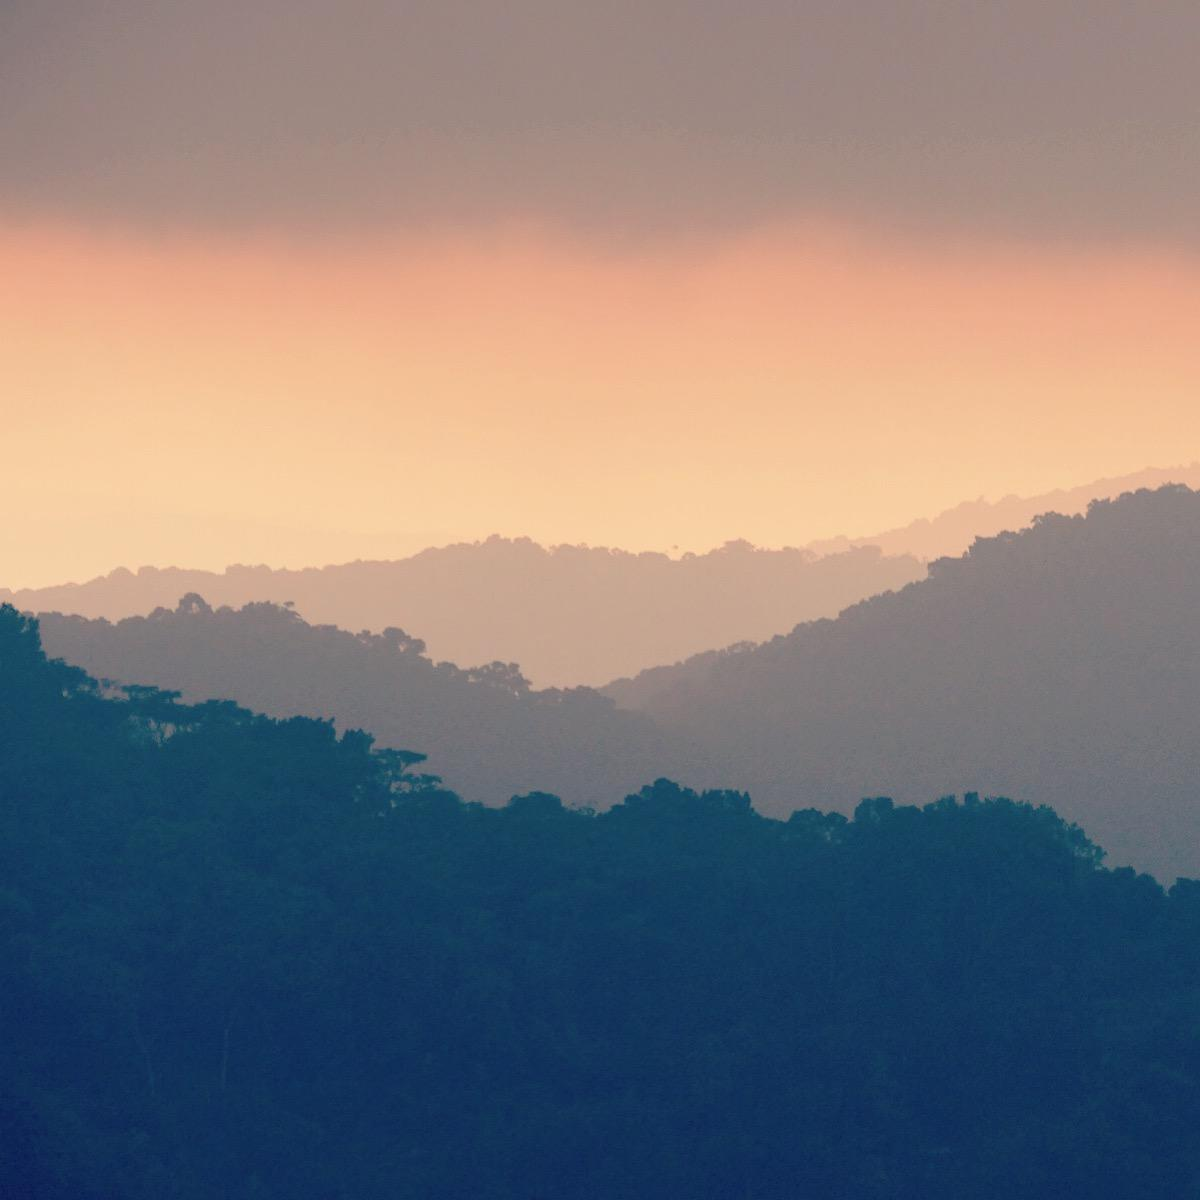 Late evening light over Ruhija, Uganda. Noah Strycker